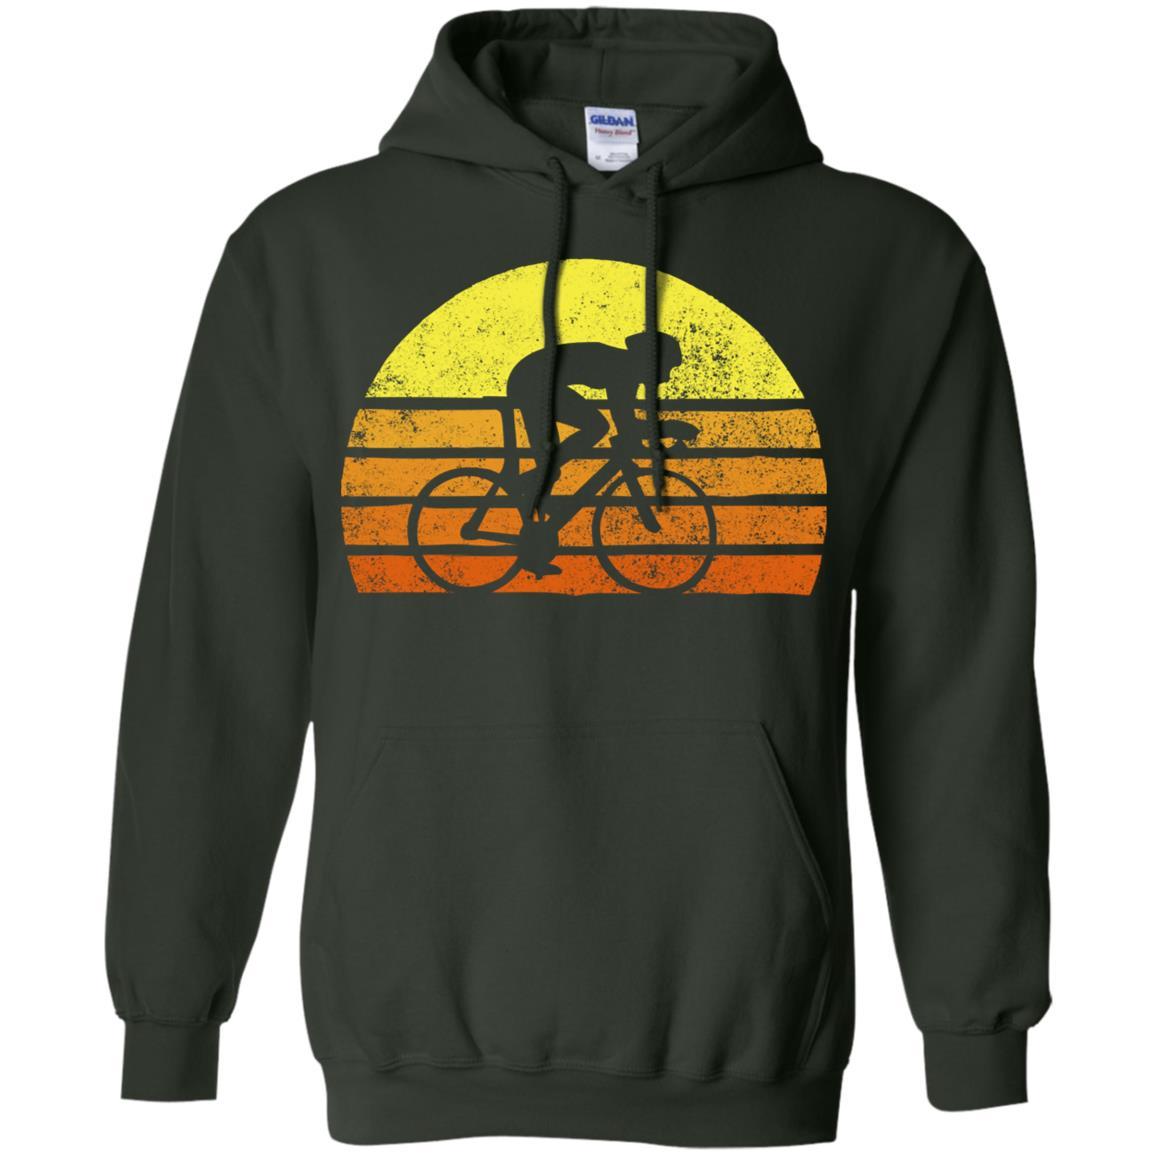 Retro Bicycle Rider Racing Vintage Sunset Pullover Hoodie